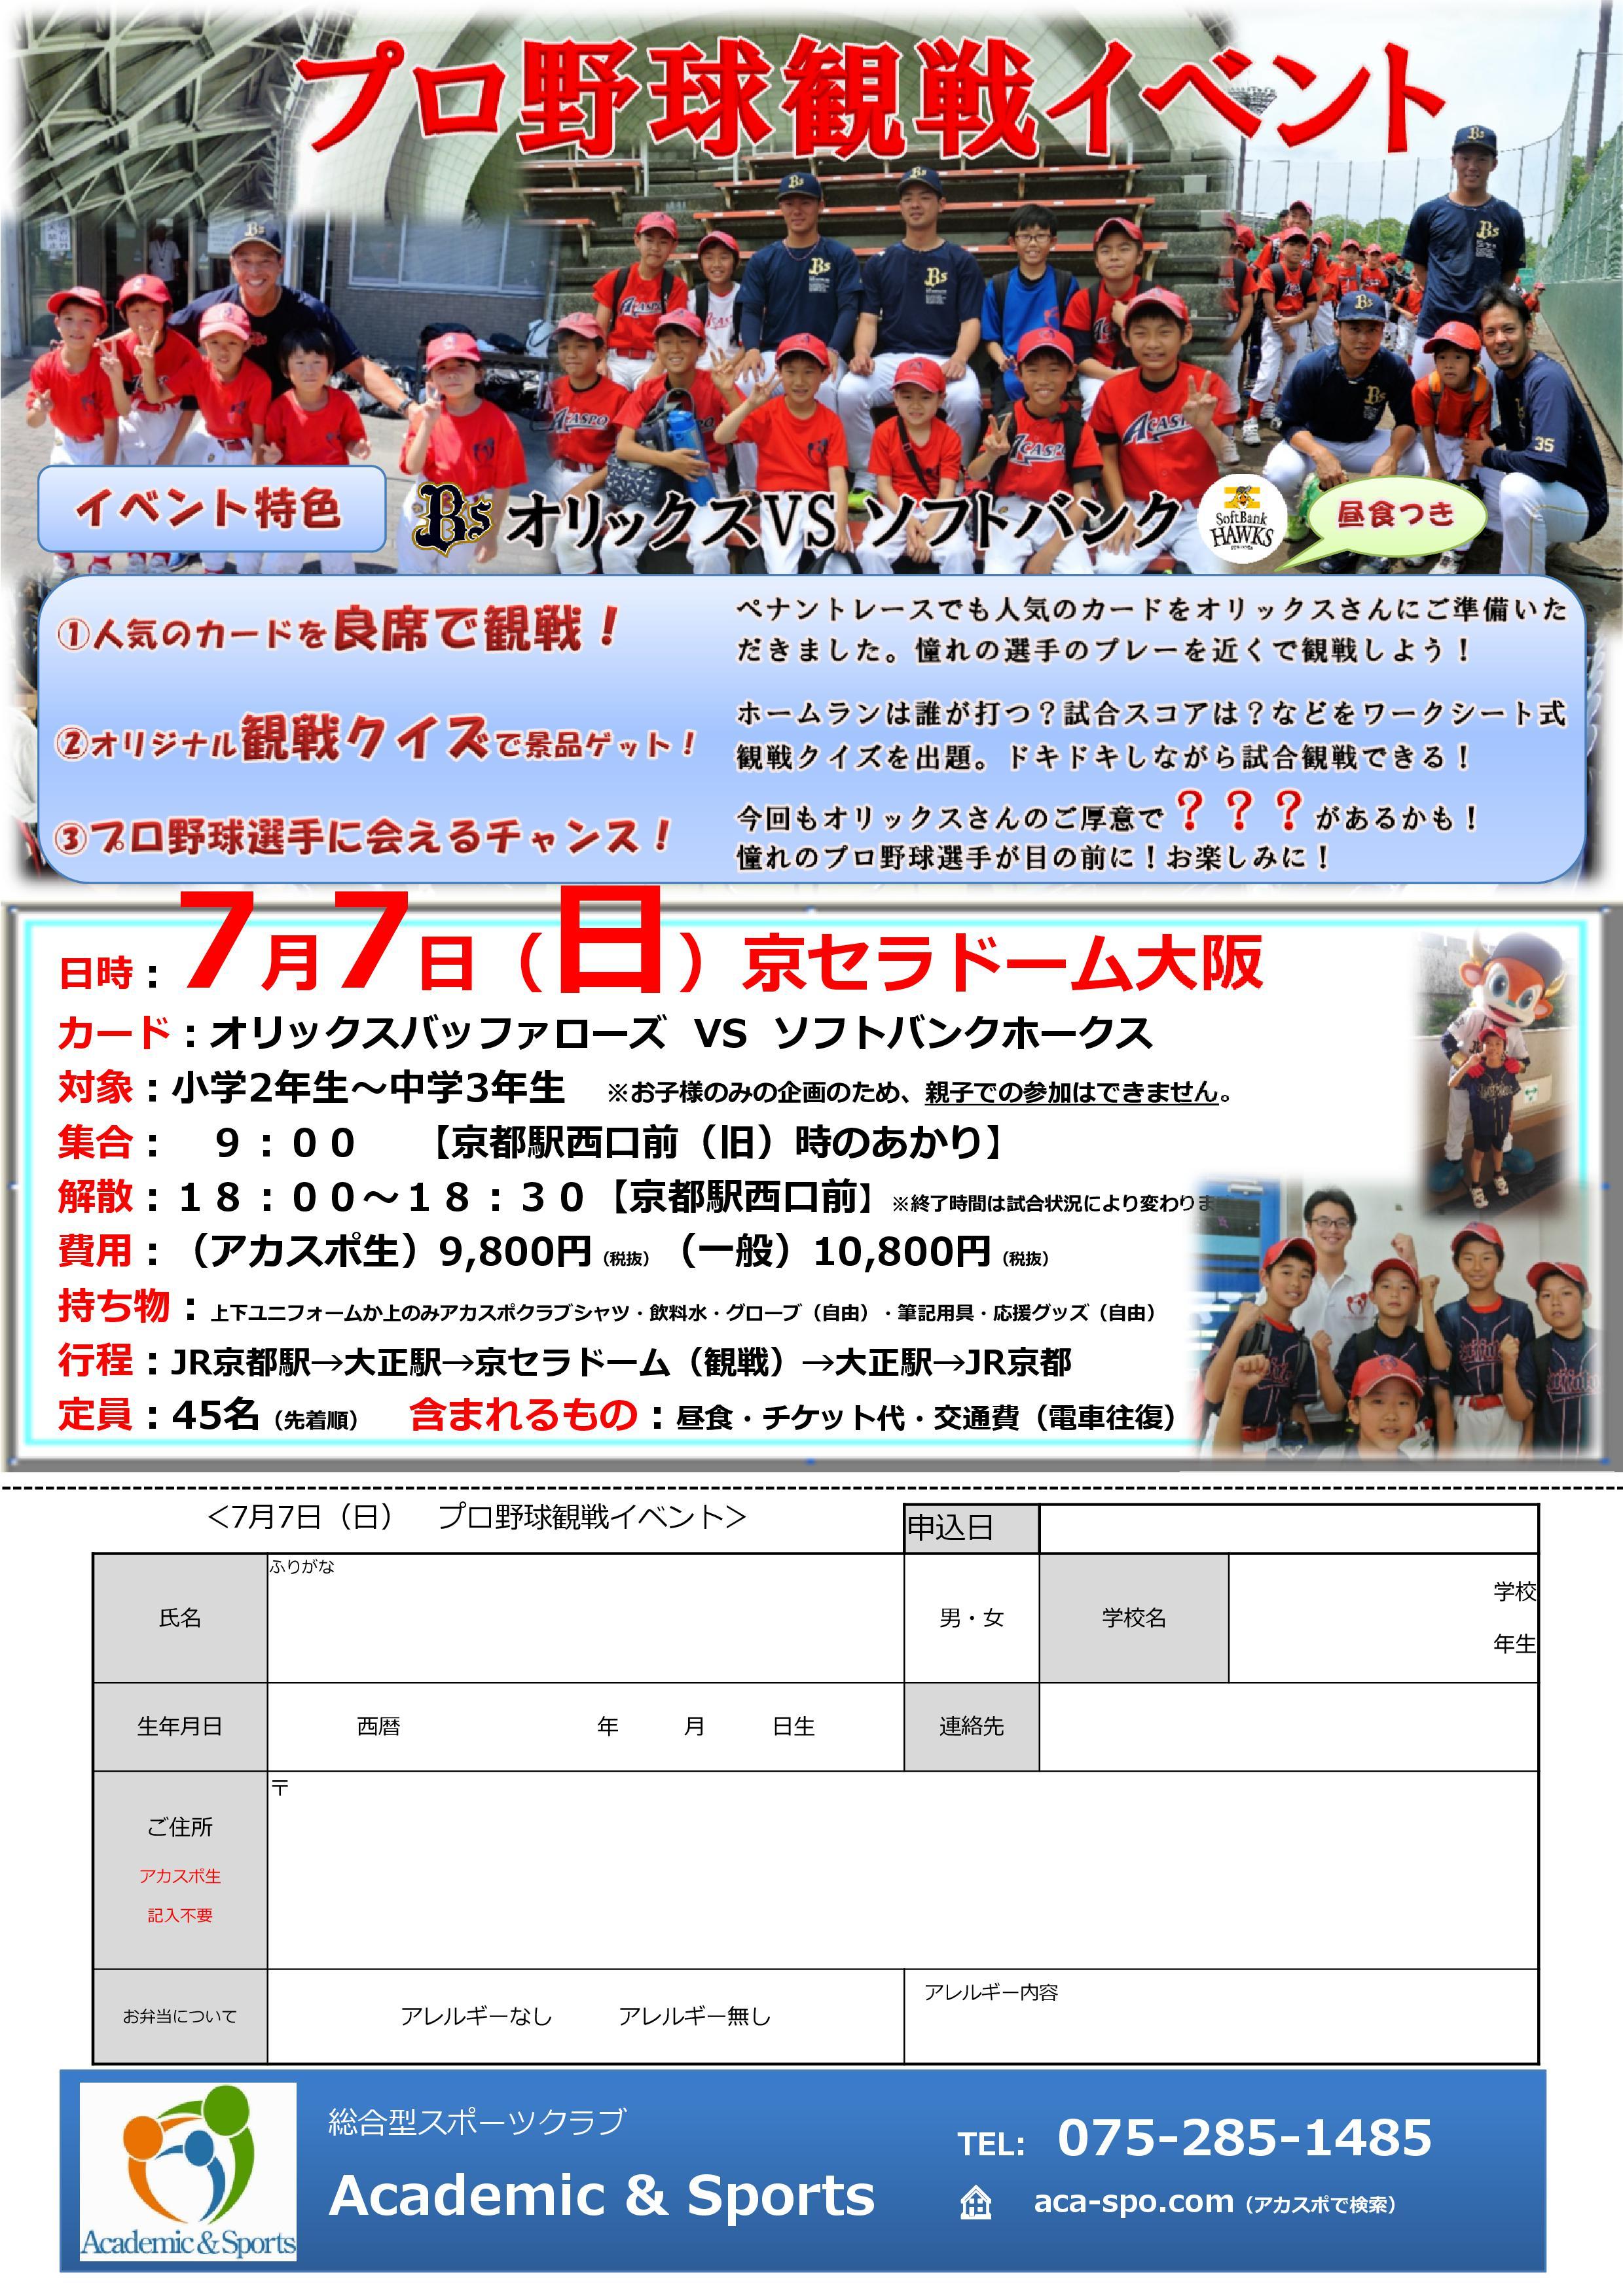 Microsoft PowerPoint - プロ野球観戦イベント2019